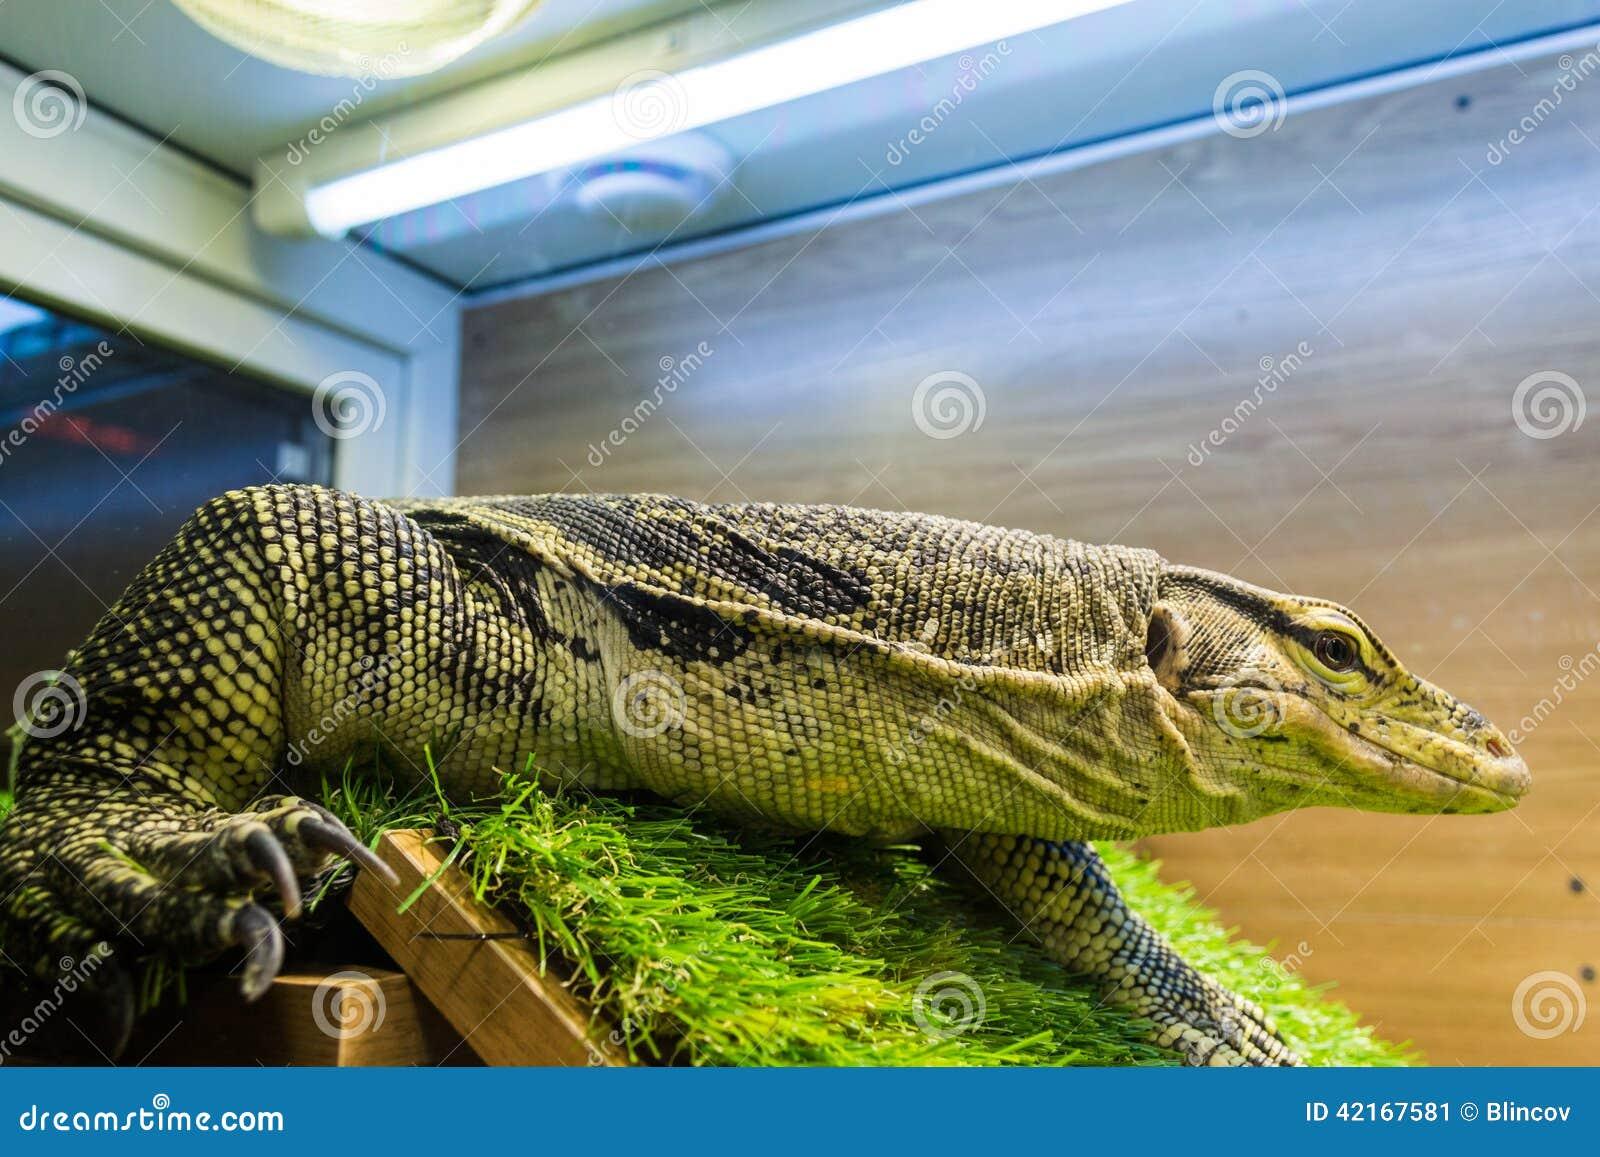 Monitor Lizard Varanus In The Terrarium Stock Image Image Of